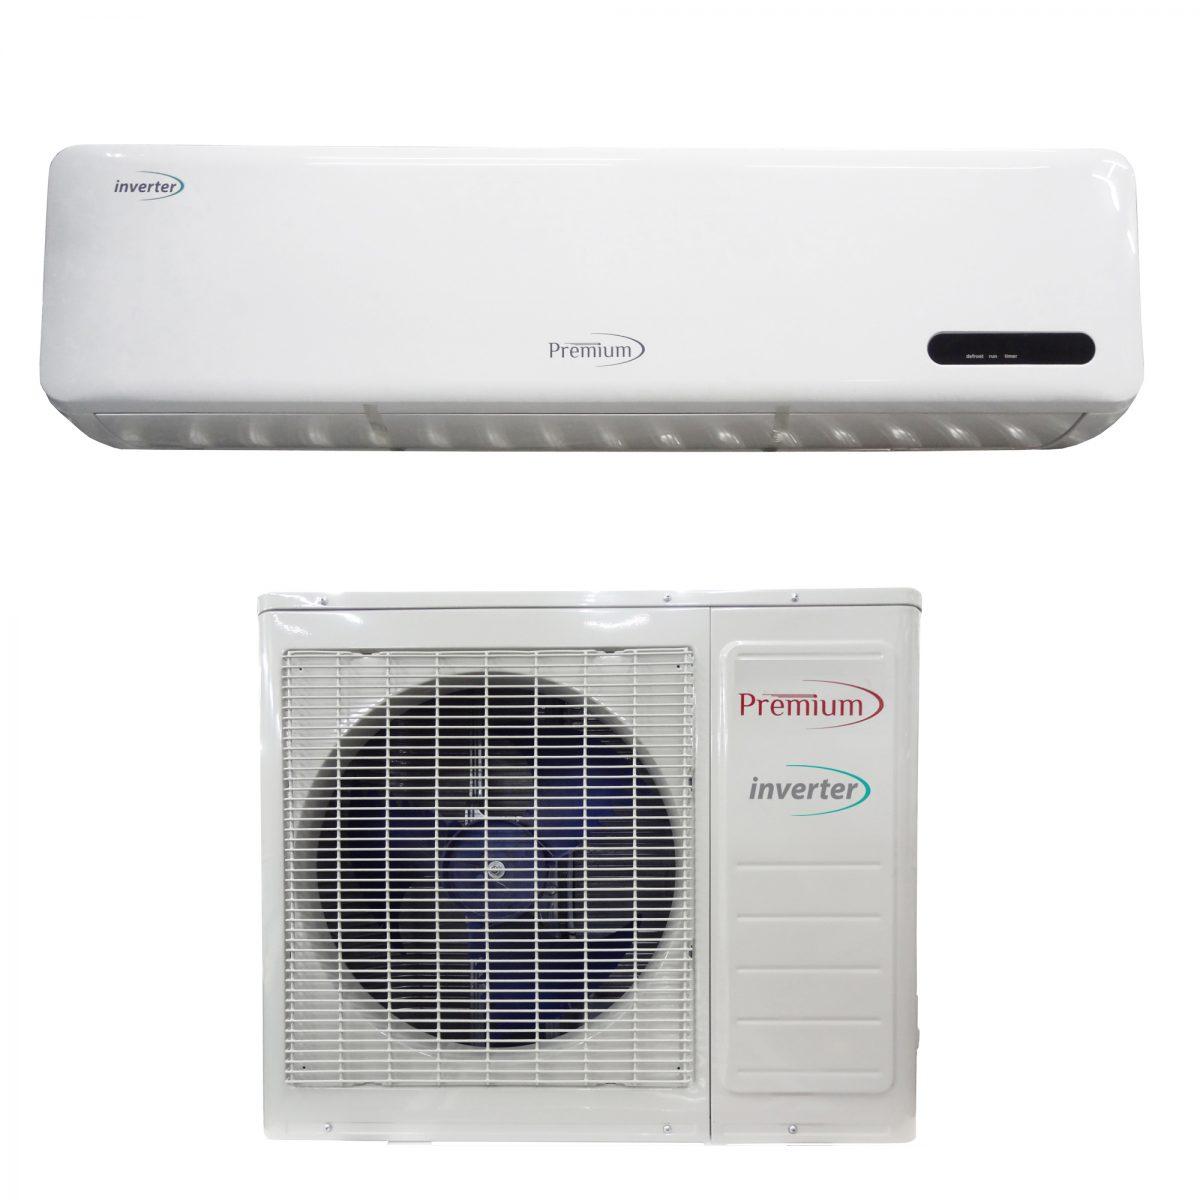 Minisplit 22,000 BTU, PREMIUM, 220V, Cooling Only-Model: PIA22064A/PIA22065B